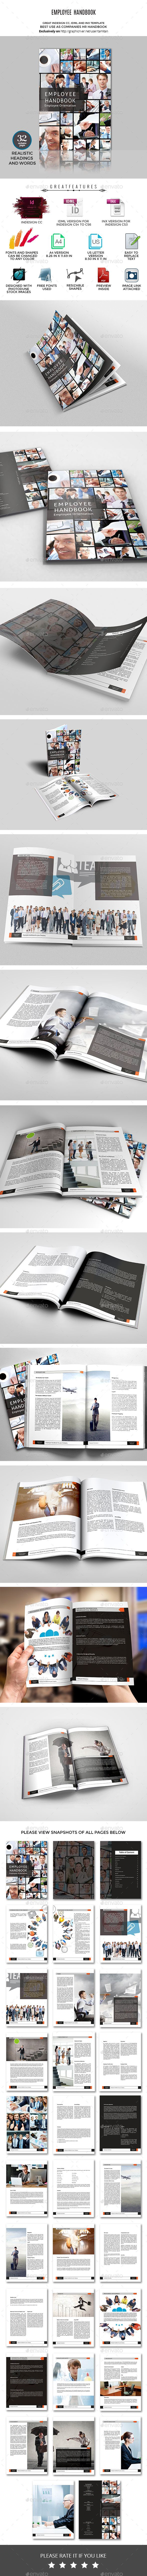 Employee Handbook Manual | Pinterest | Employee handbook, Indesign ...